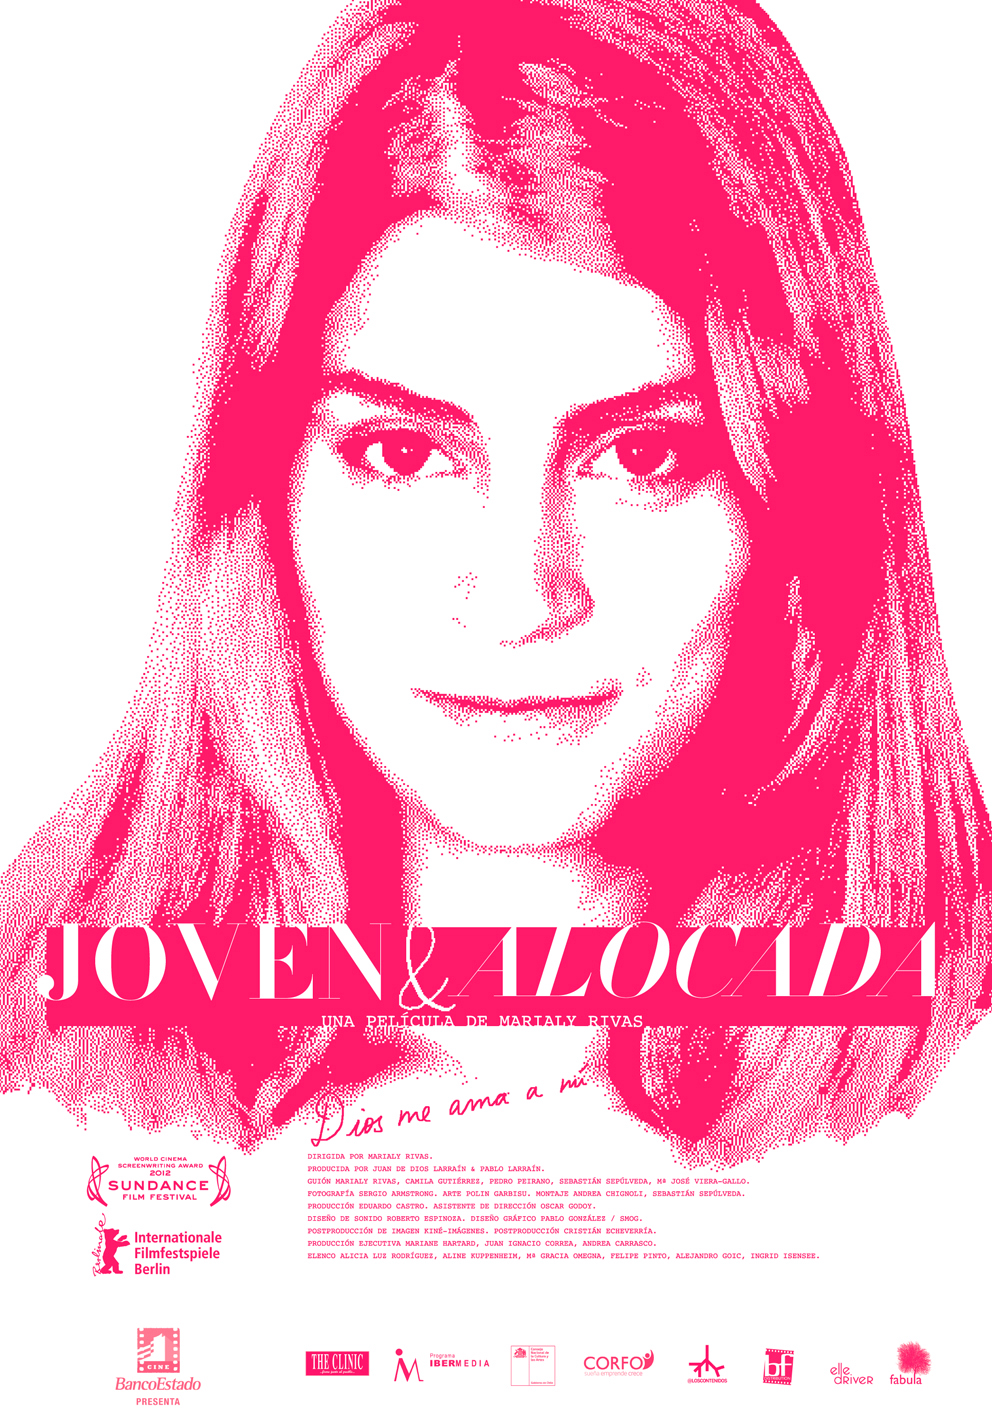 Alicia rodriguez maria gracia omegna joven y alocada 2012 - 3 6